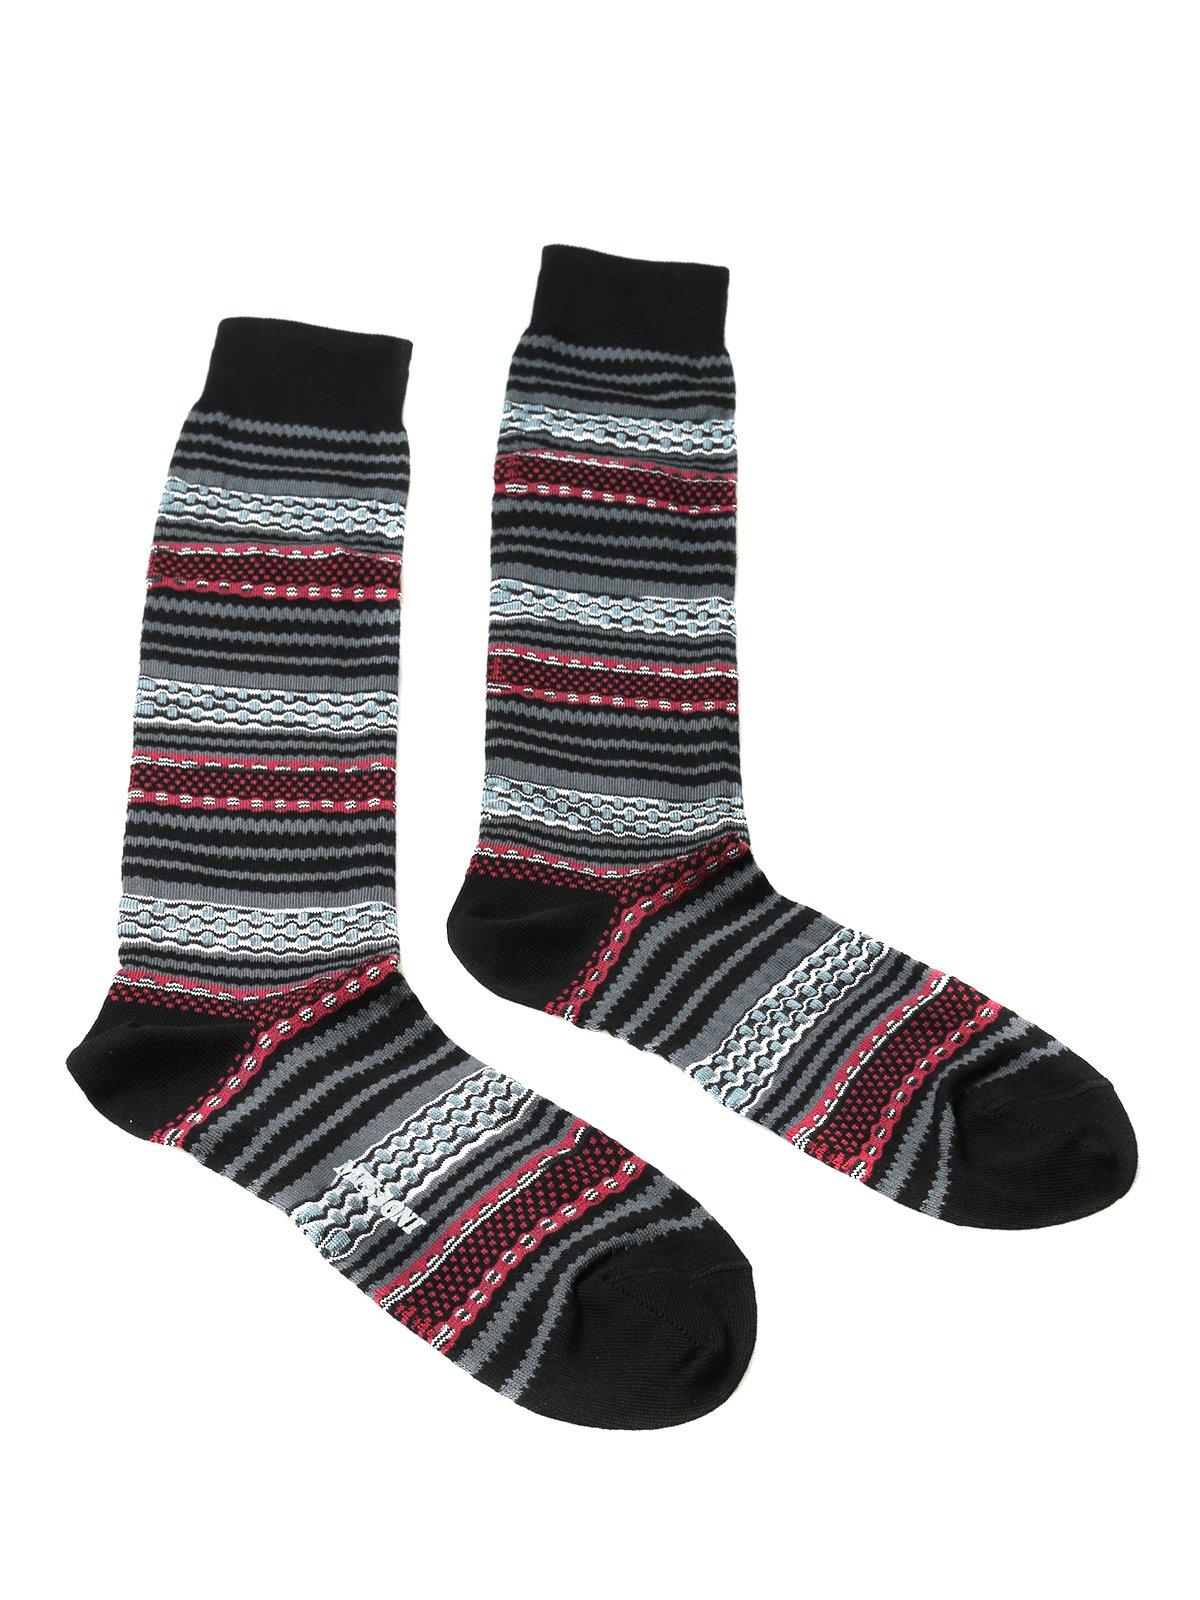 Missoni GM00CMU5696 0001 Gray/Black Mixed Stripe Calf Length Socks